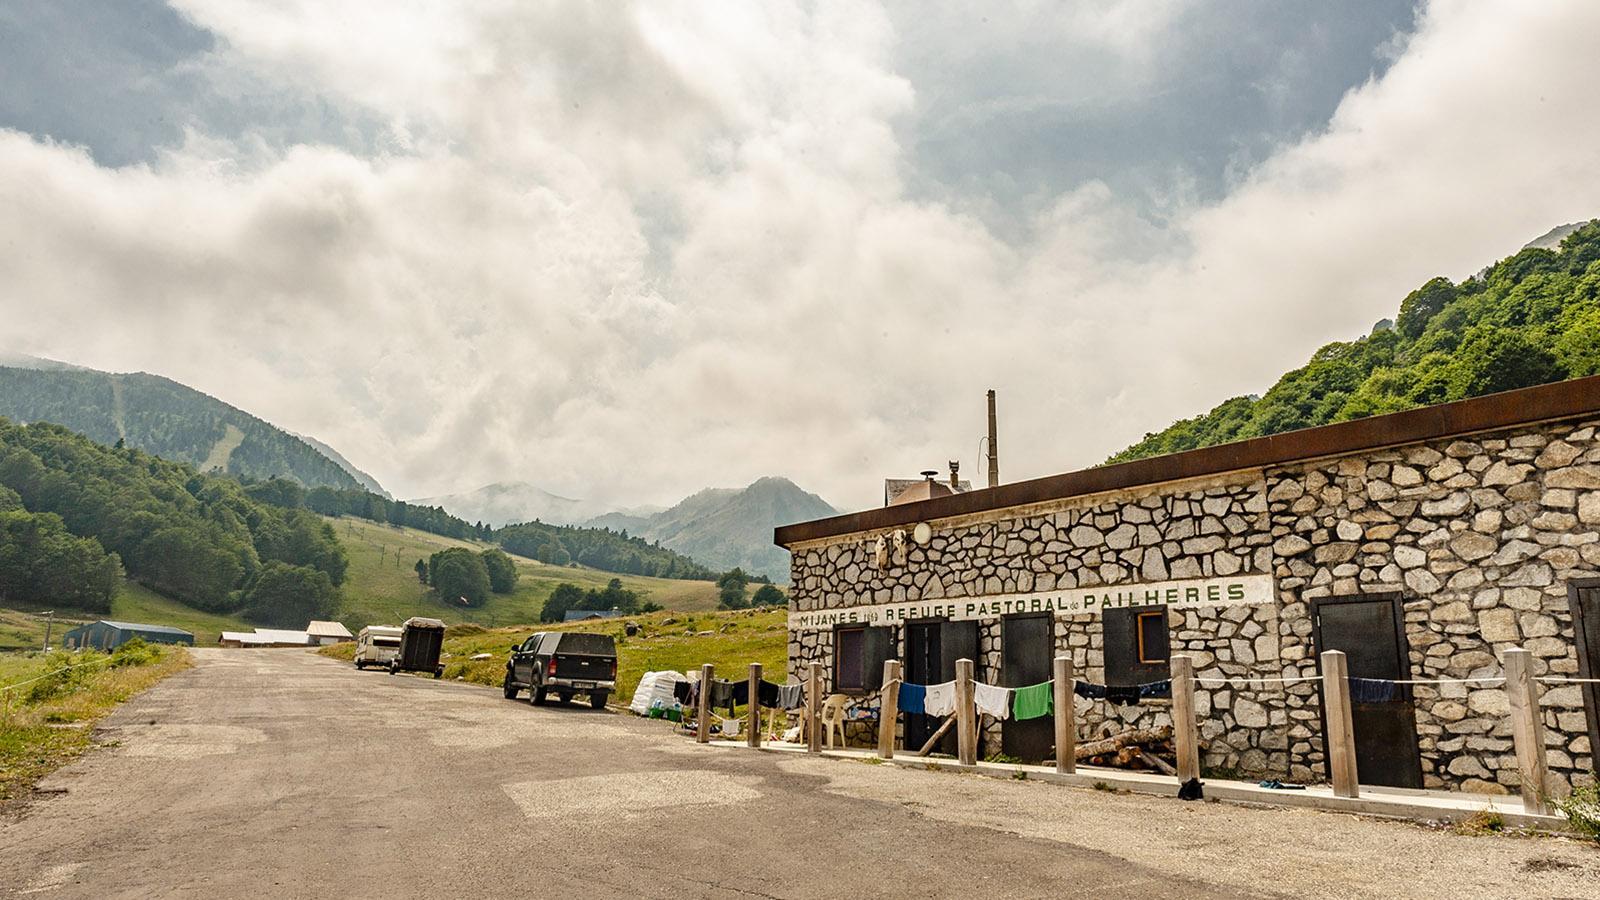 Col de Pailheres: Die Schutzhütte von Mijanès. Foto: Hilke Maunder